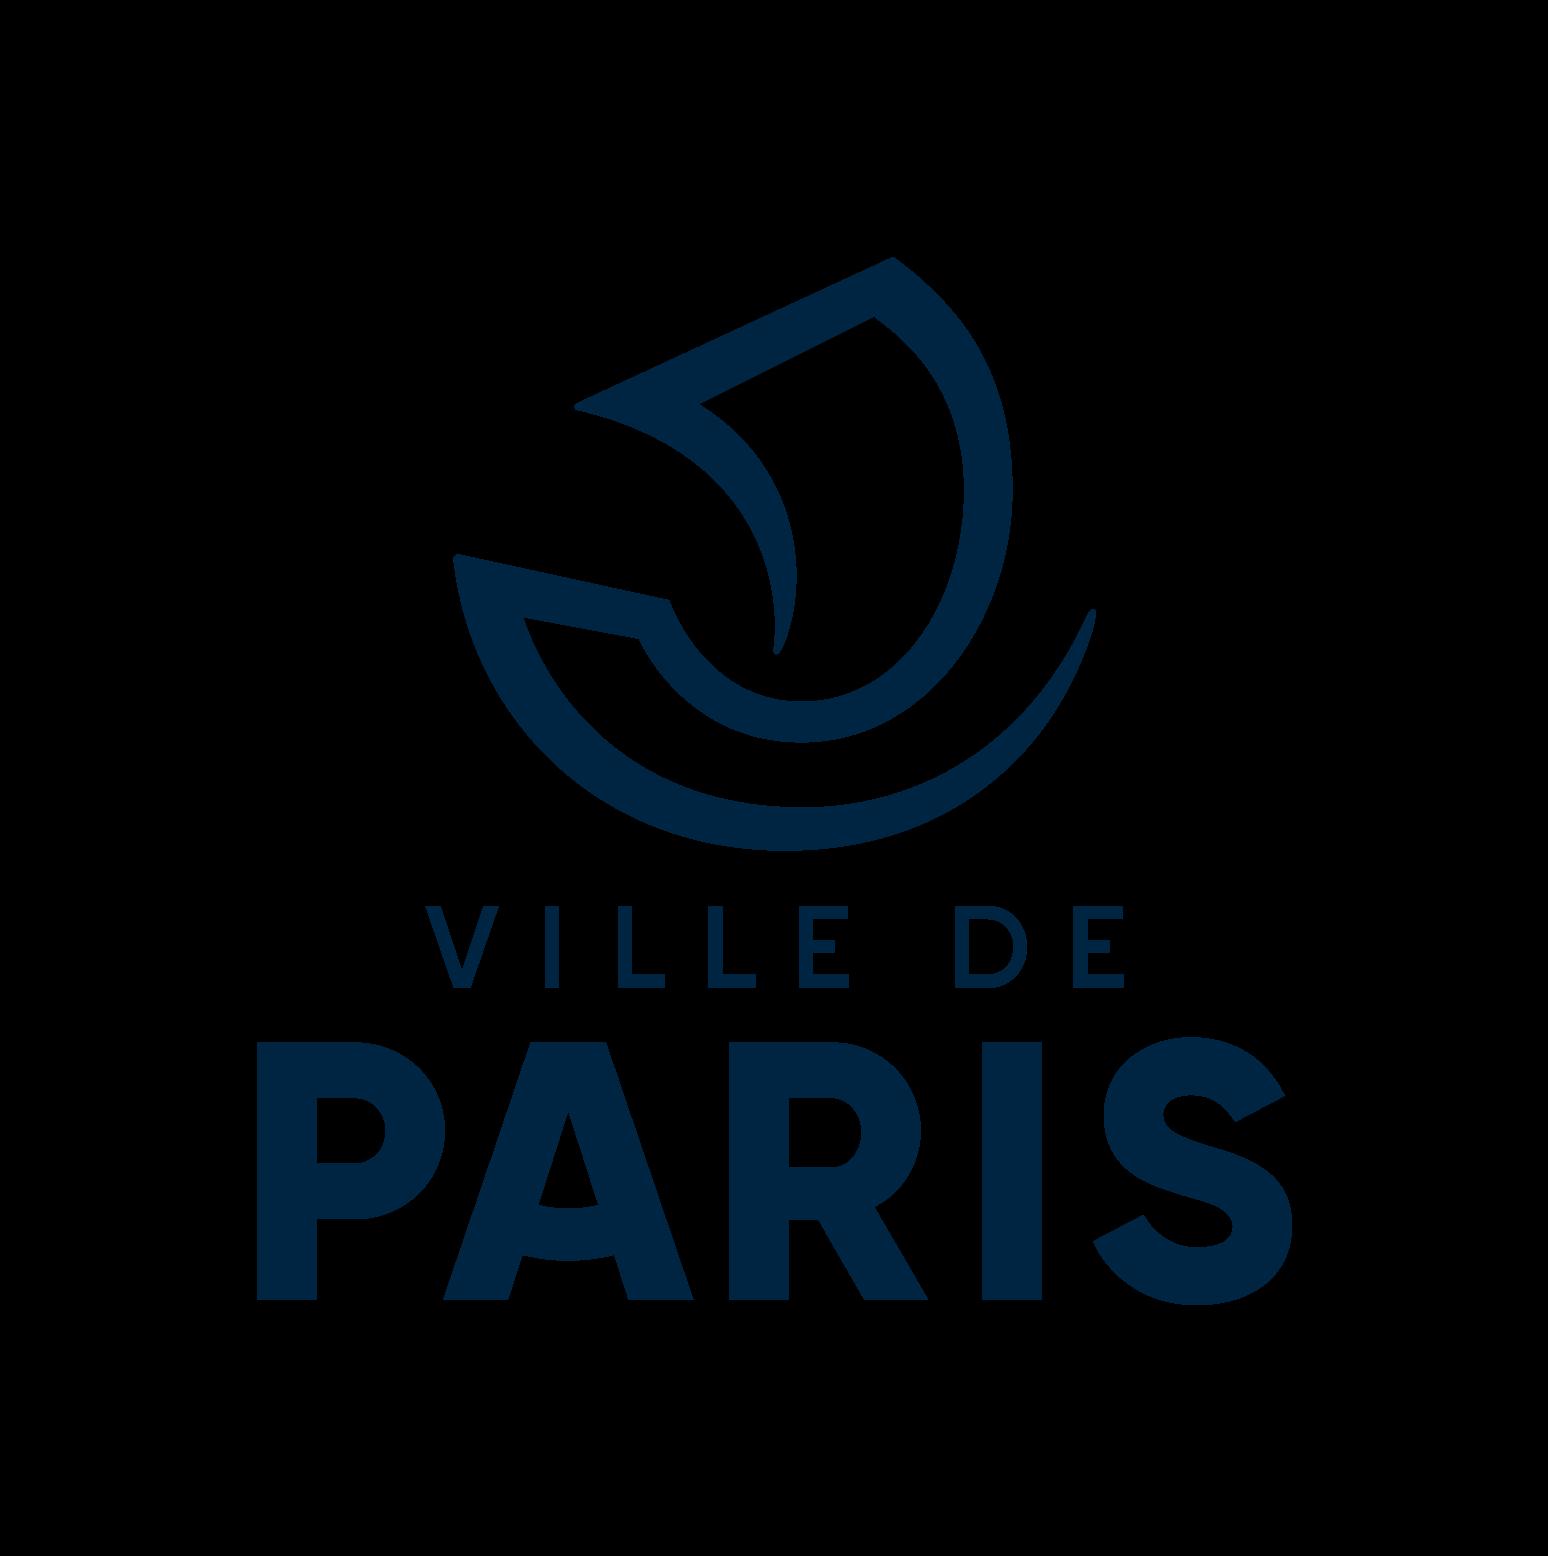 VILLE_DE_PARIS_LOGO_VERTICAL_POS_RVB_TRANS